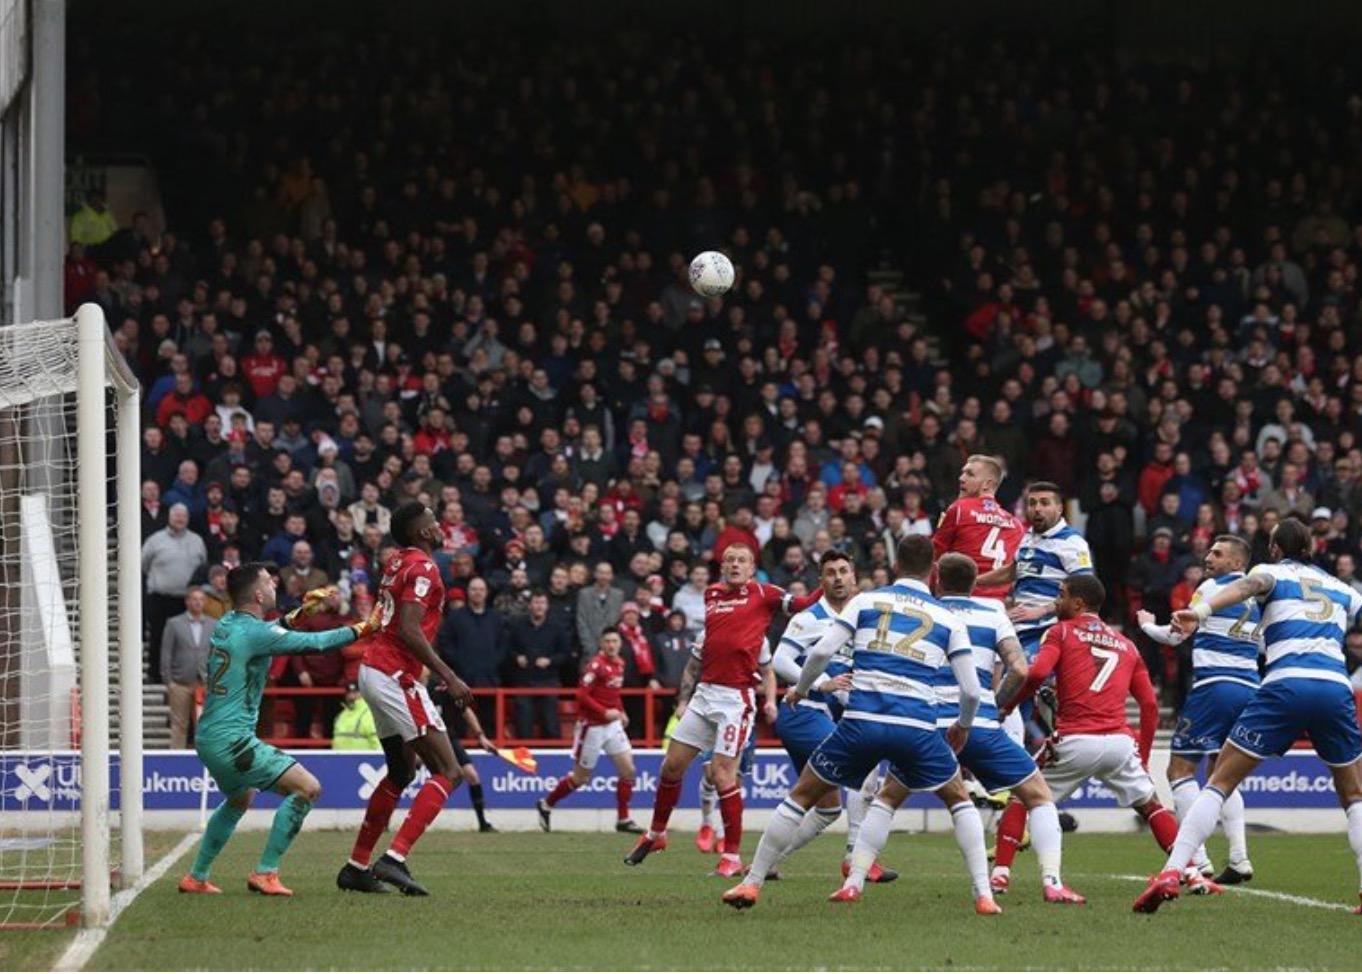 Nottingham Forest 0 - 0 QPR